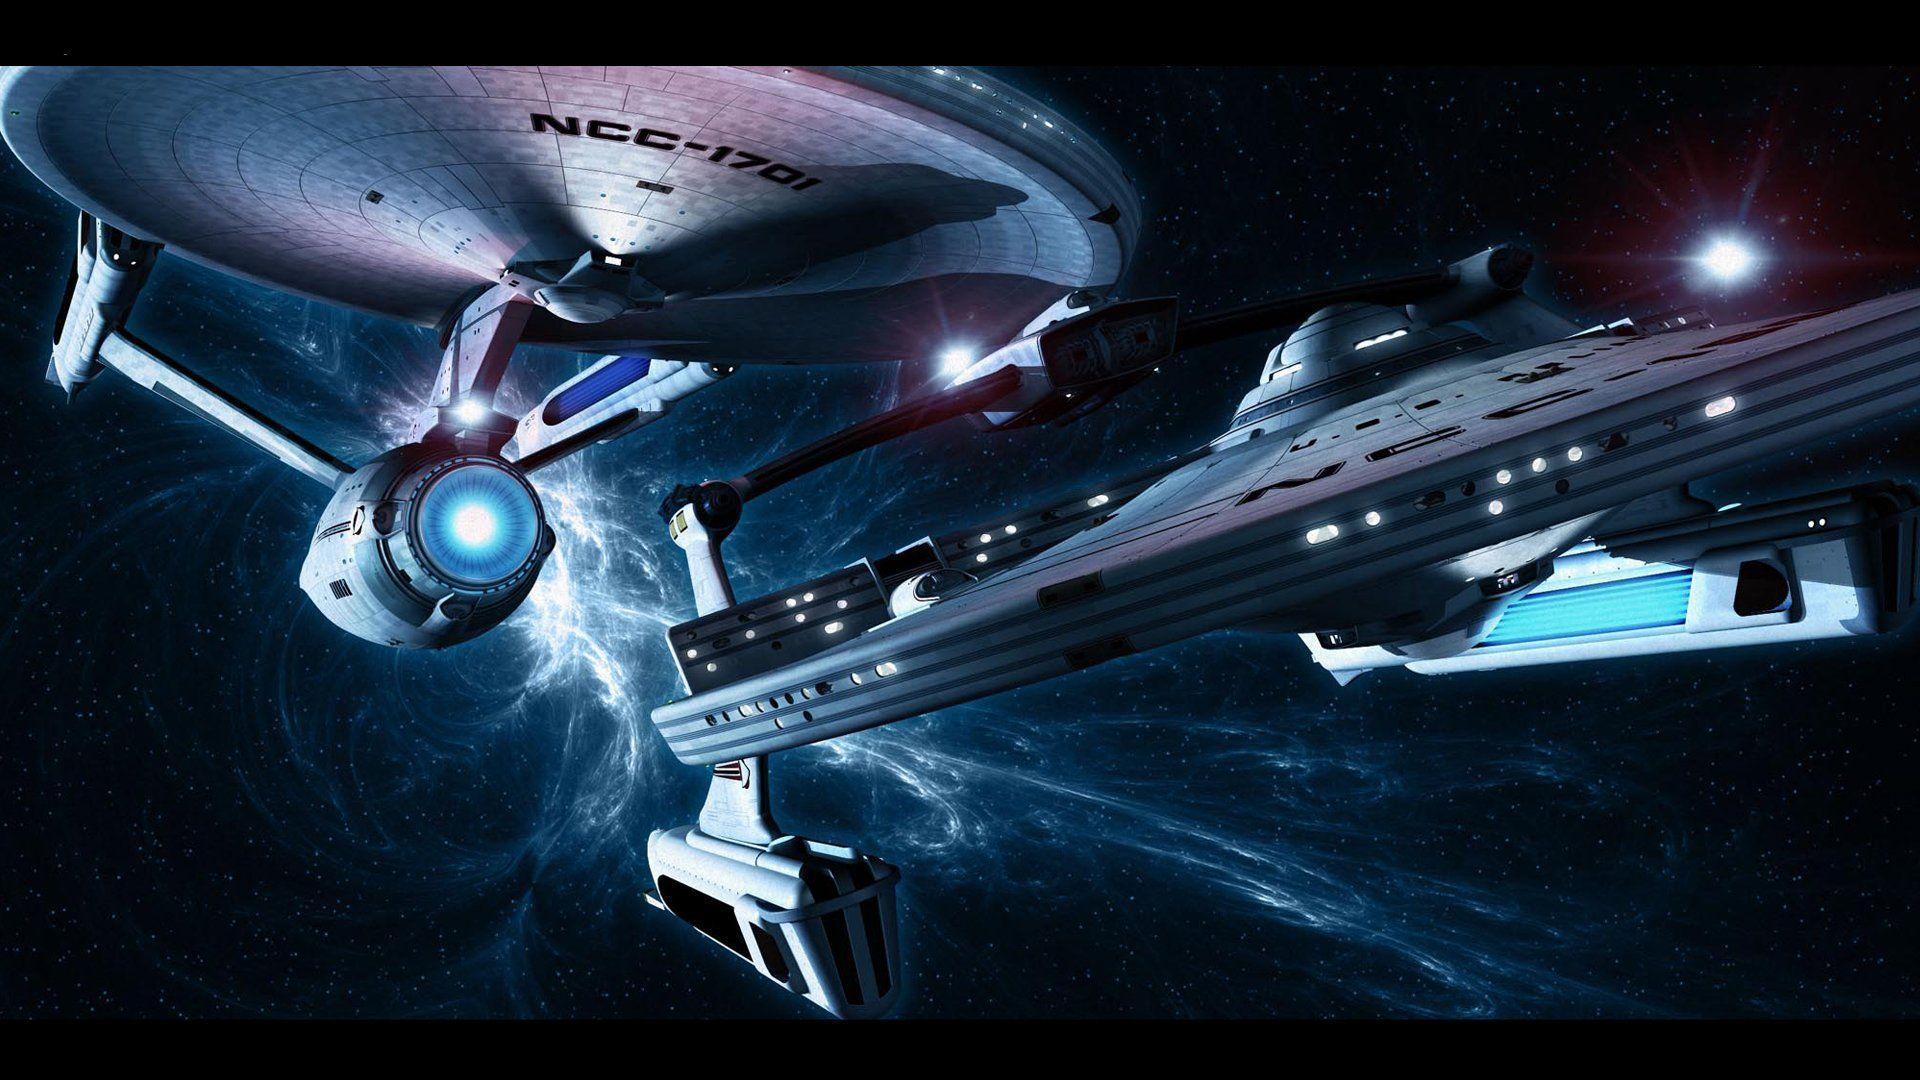 Star Trek Wallpapers - Top Free Star